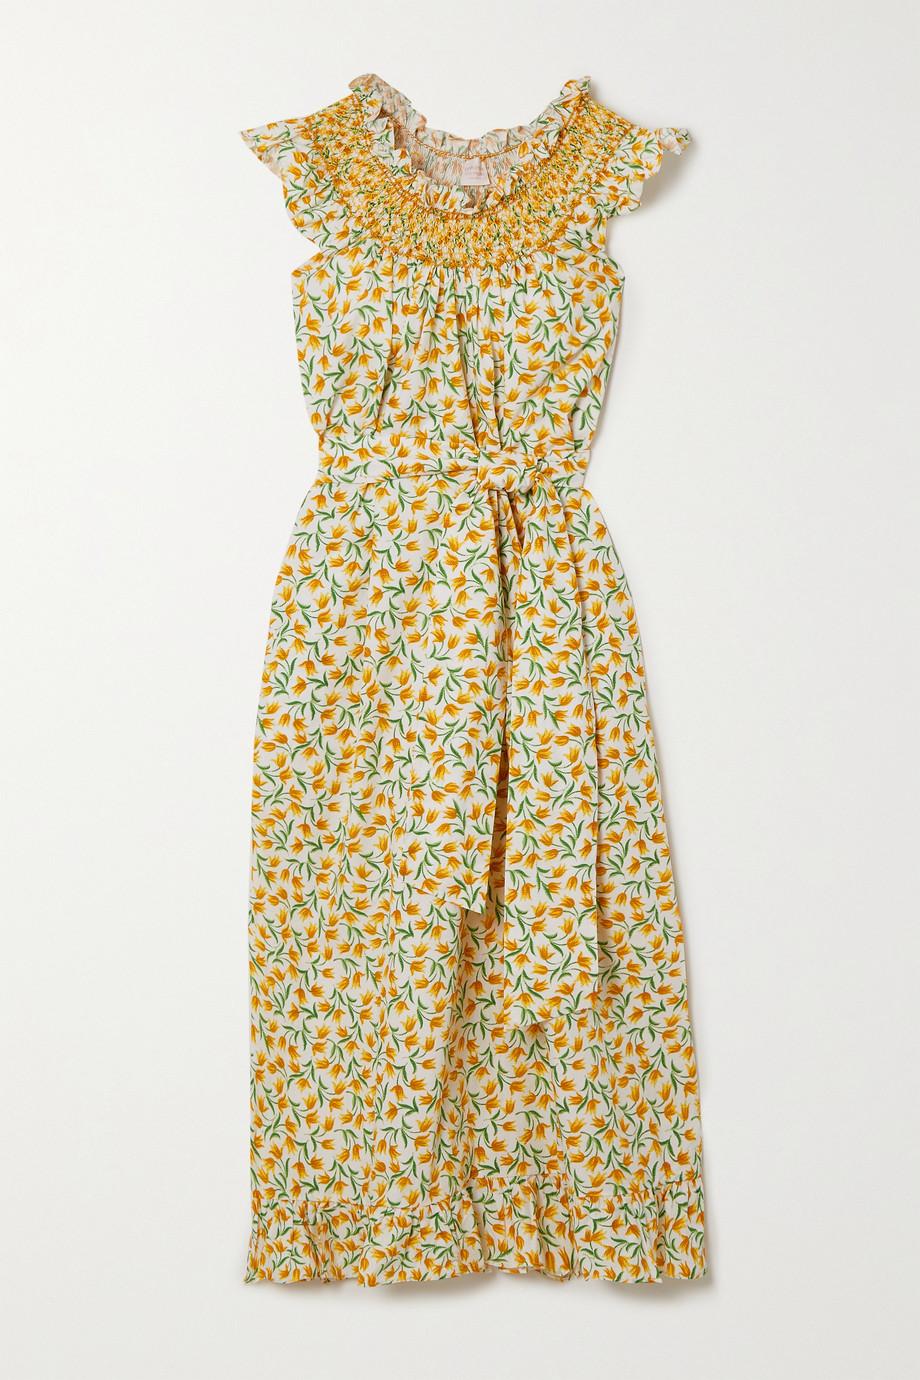 Loretta Caponi Delfina belted ruffled smocked floral-print cotton-voile midi dress